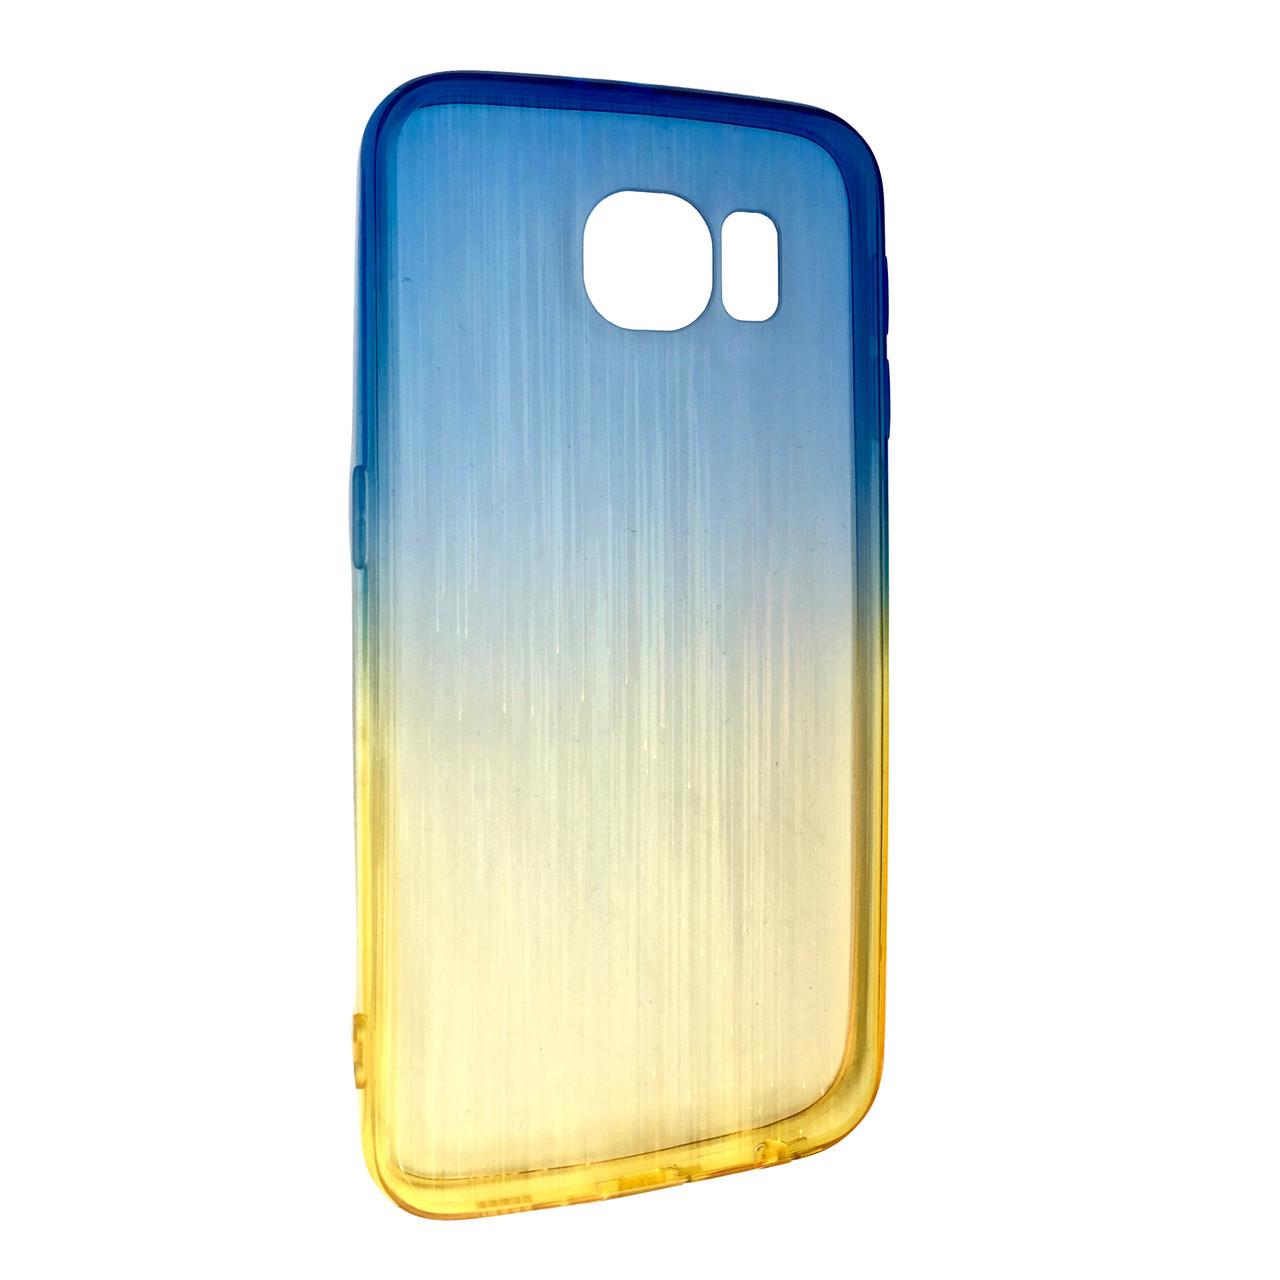 Чехол радуга градиент SAMSUNG S6 (yellow/blue)